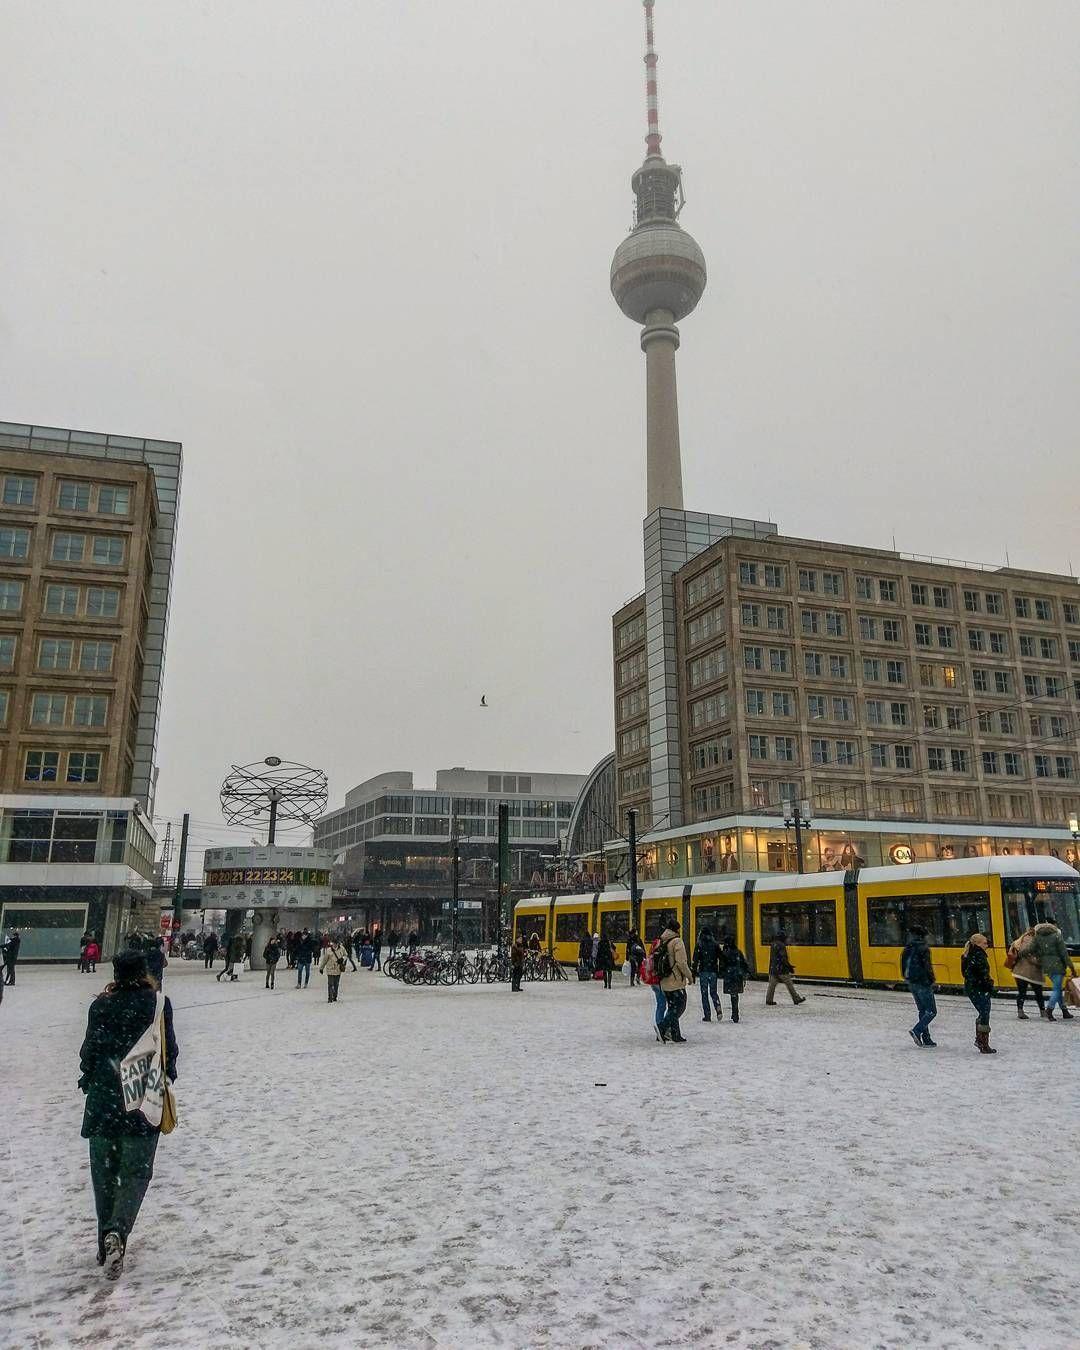 First Snow Snow Winter Berlin Alexanderplatz Berlino Snowing Cold Igersdeutschland Igersberlin Igerberlin Lines Arch Berlin Germany Berlin Germany